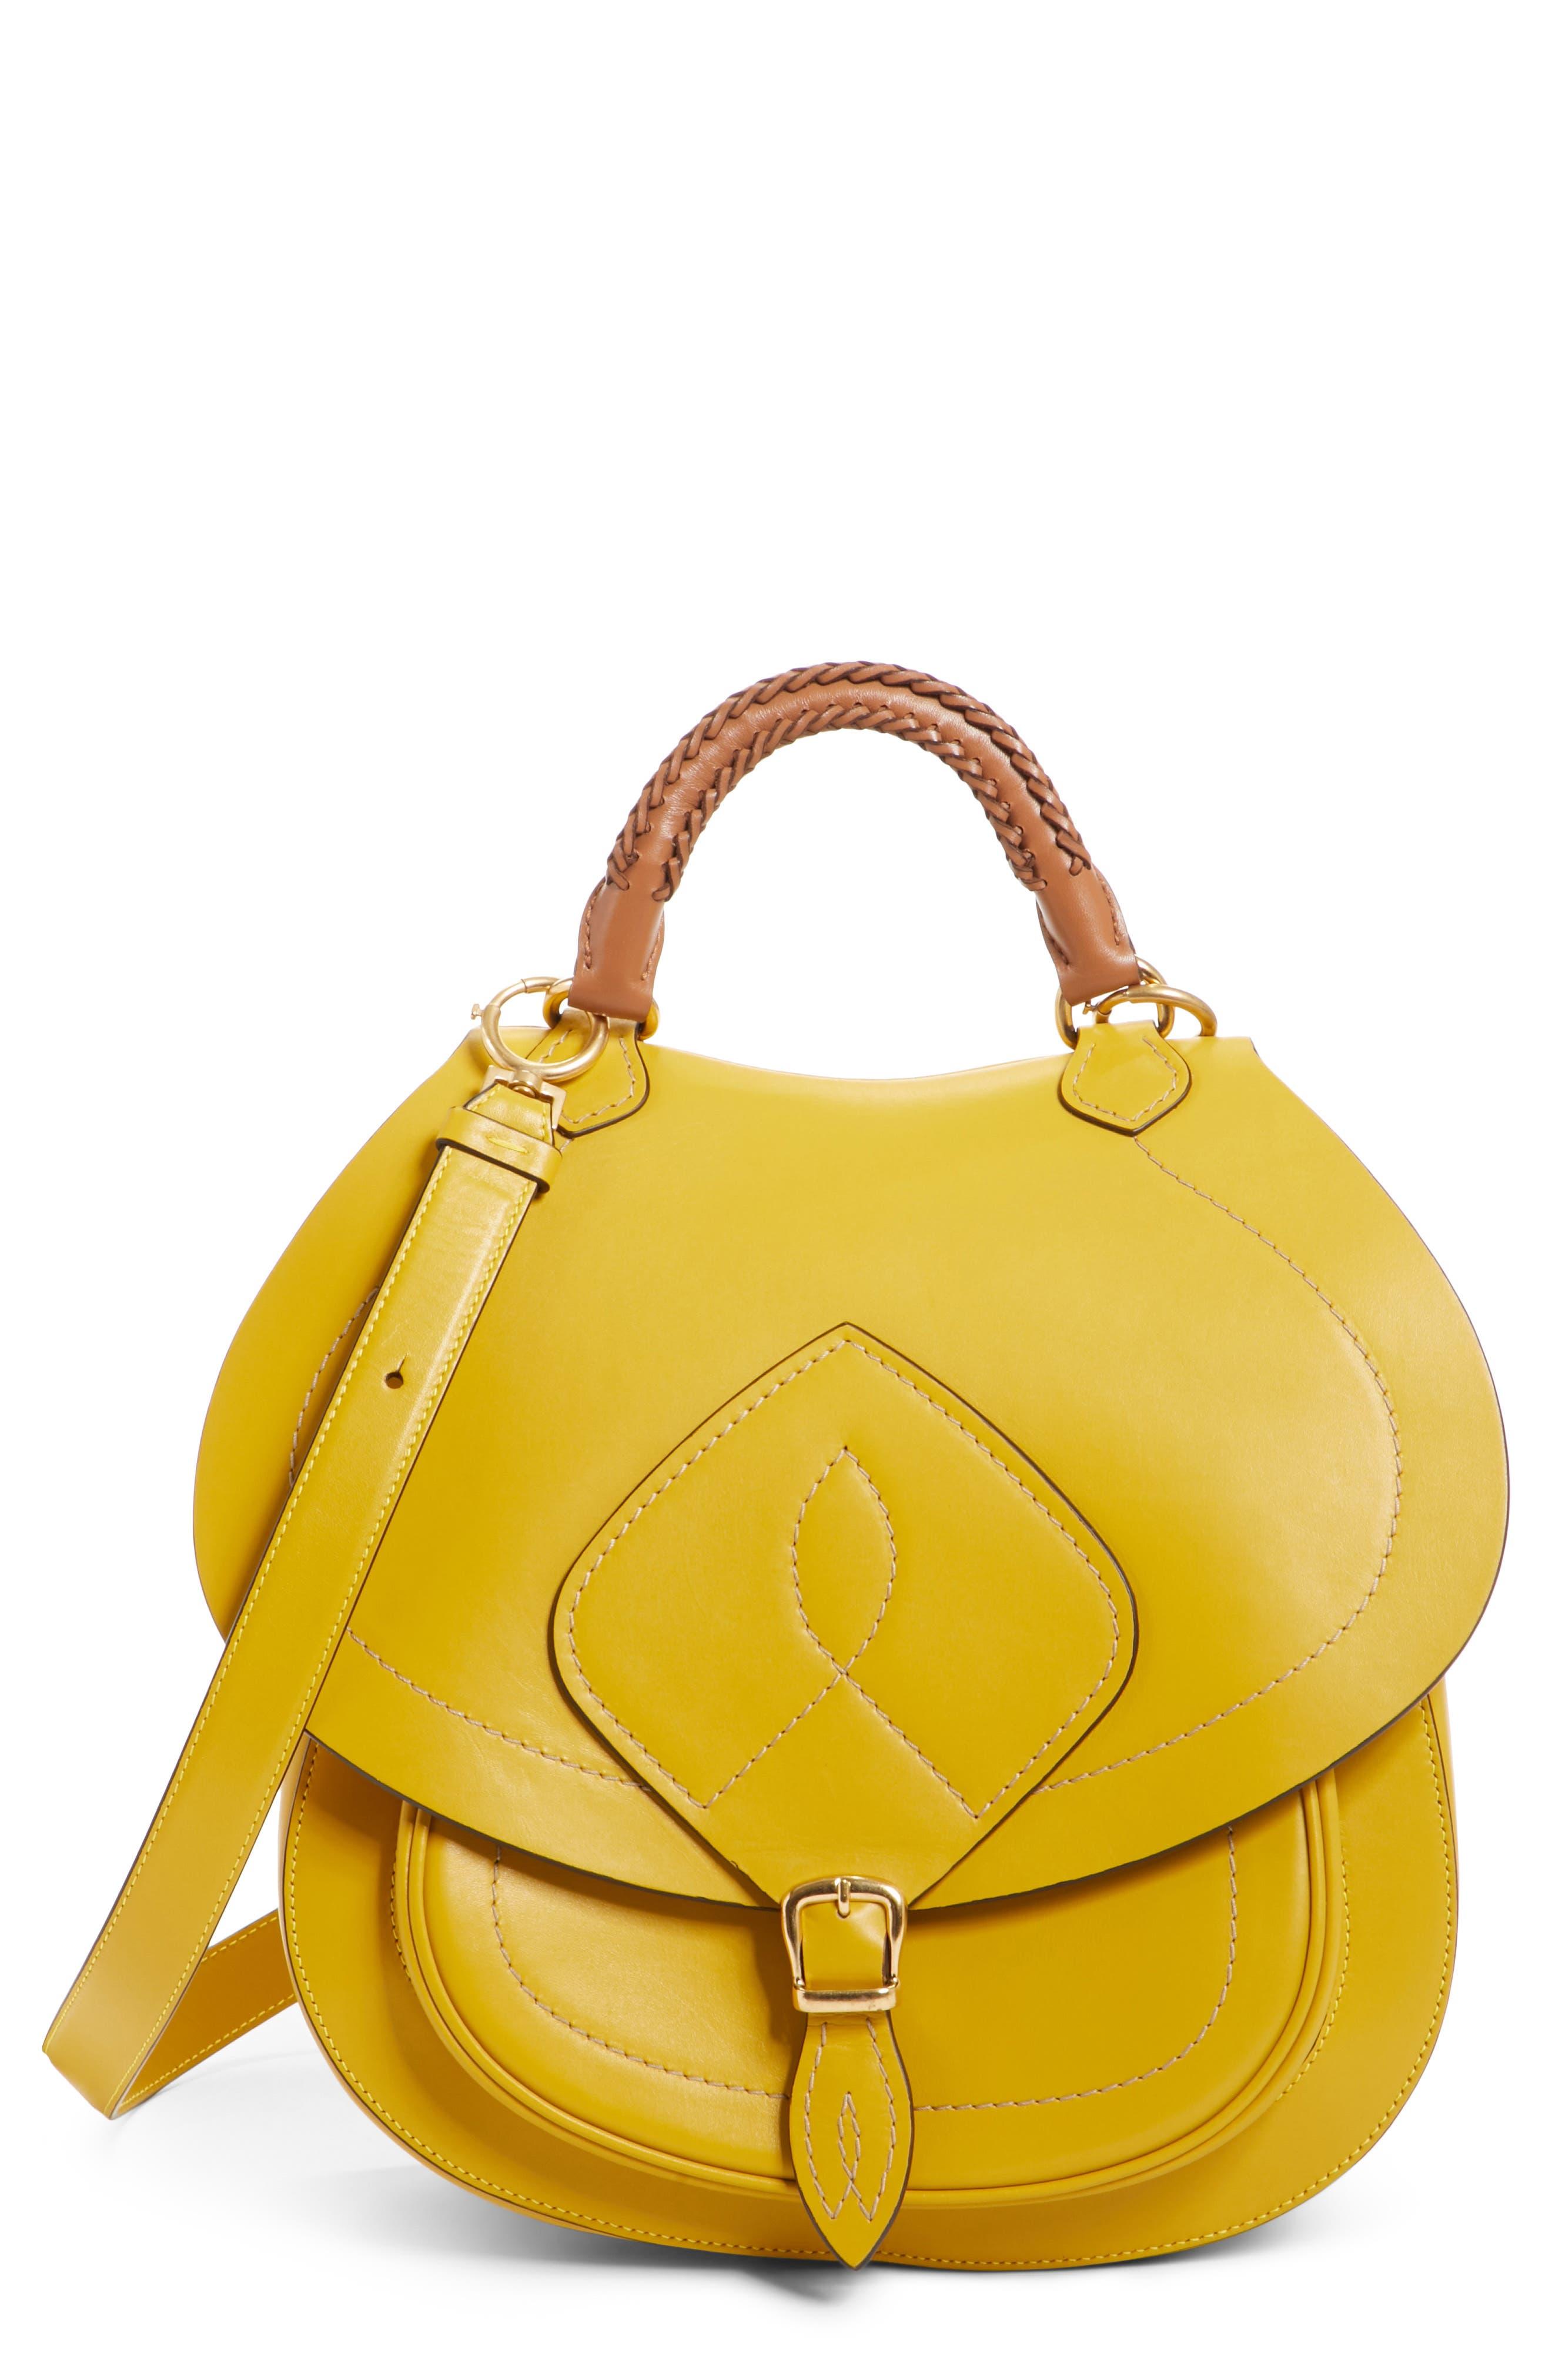 Large Bag Slide Leather Saddle Bag,                             Main thumbnail 1, color,                             YELLOW